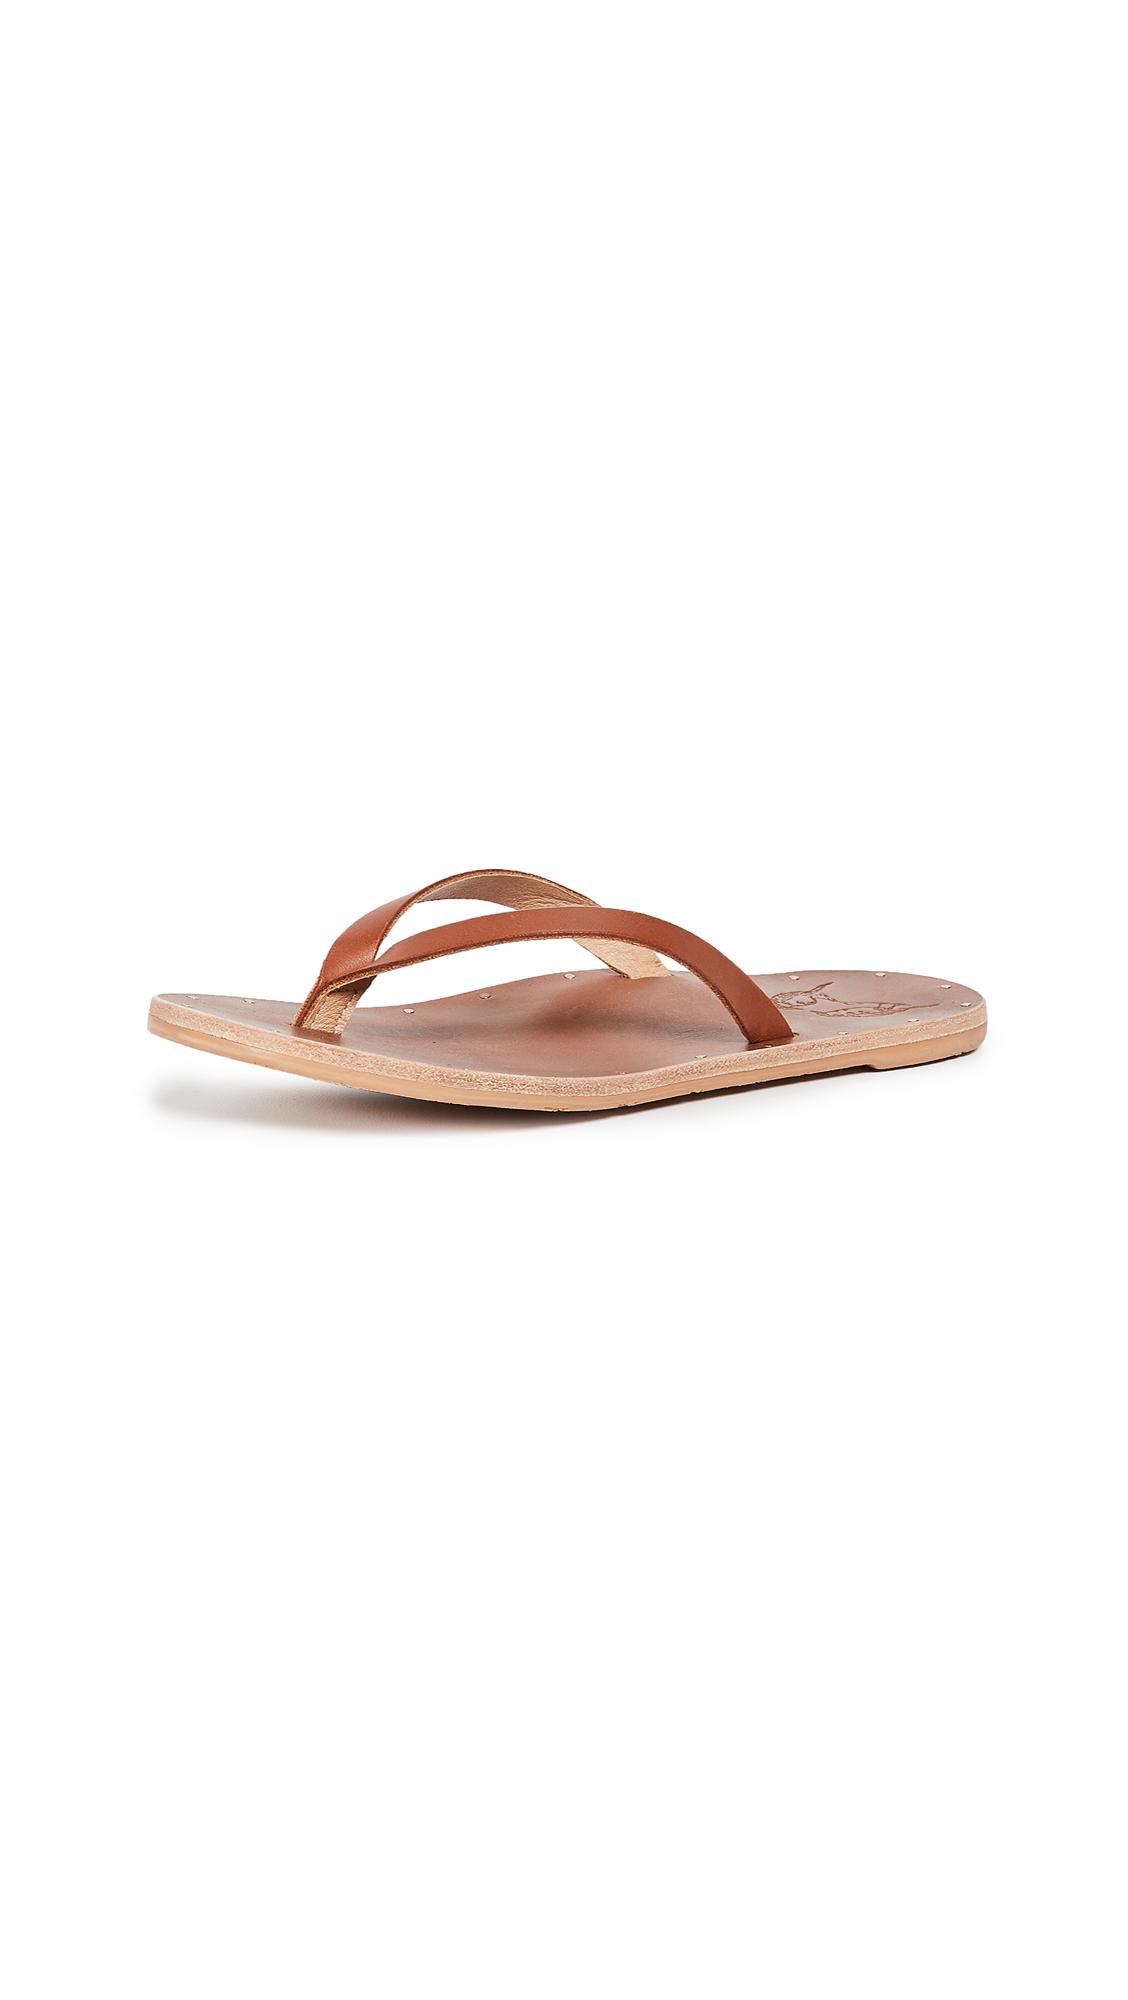 beek Seabird Flip Flops - Tan/Tan